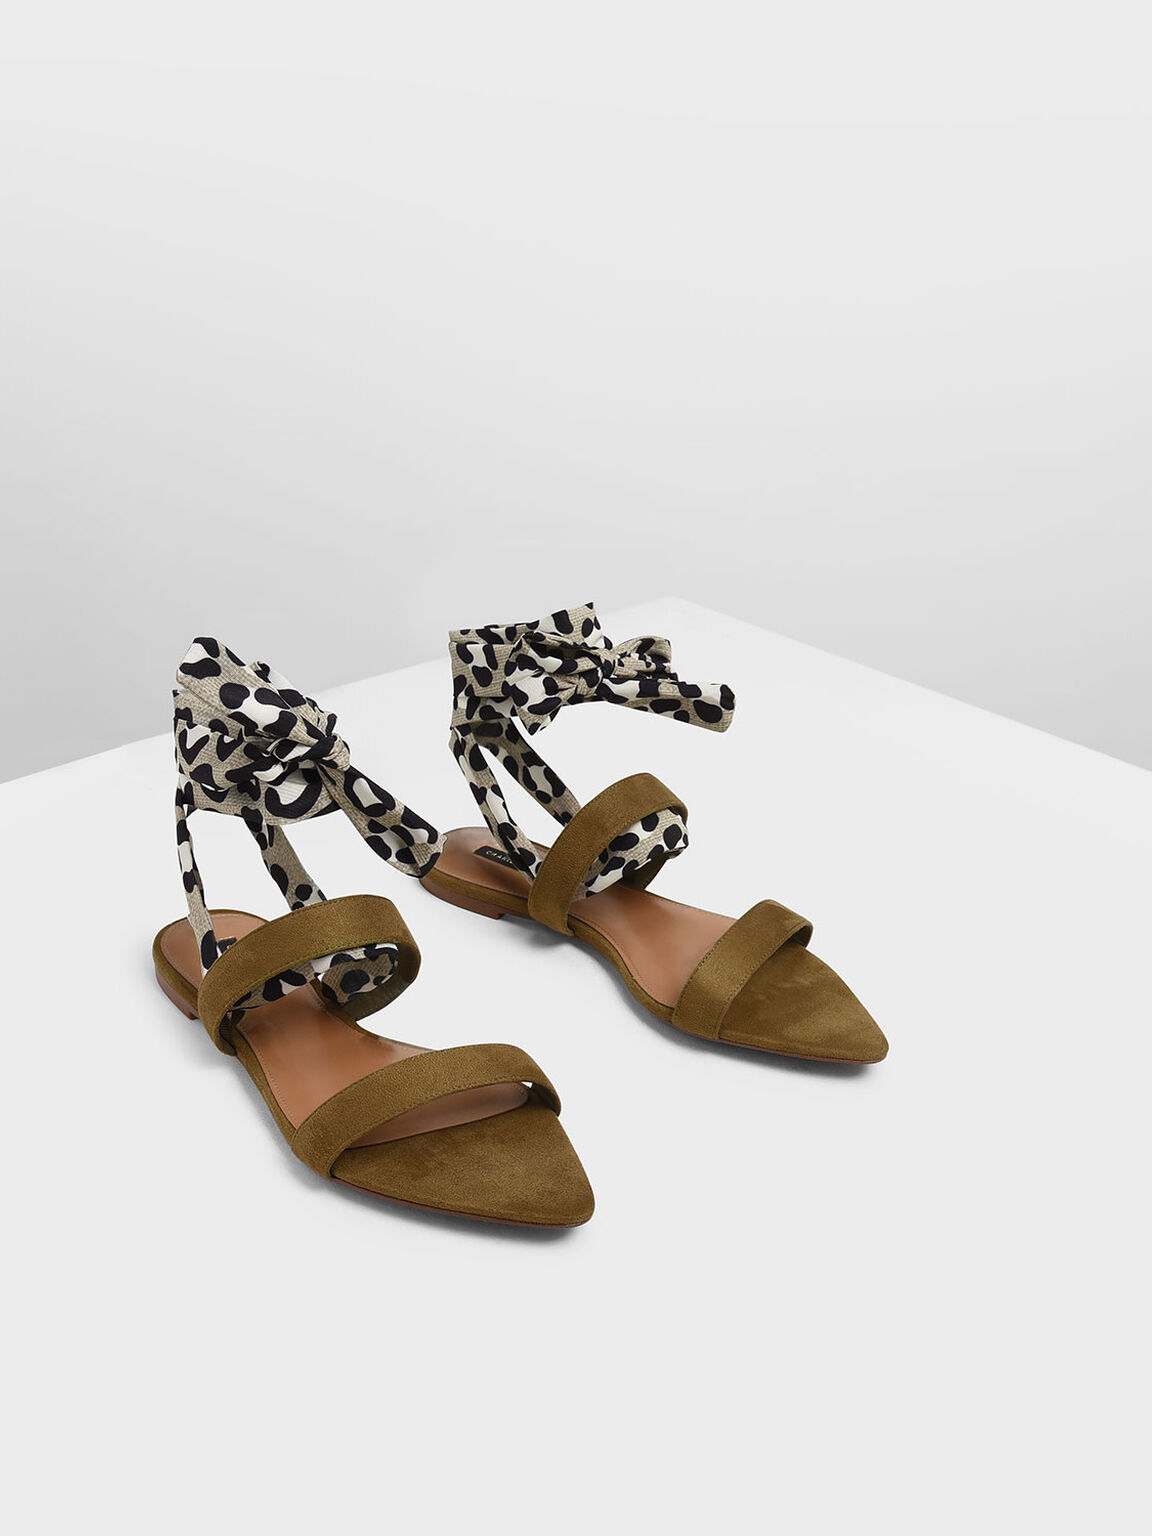 Leopard Print Ankle Wrap Sandals, Olive, hi-res